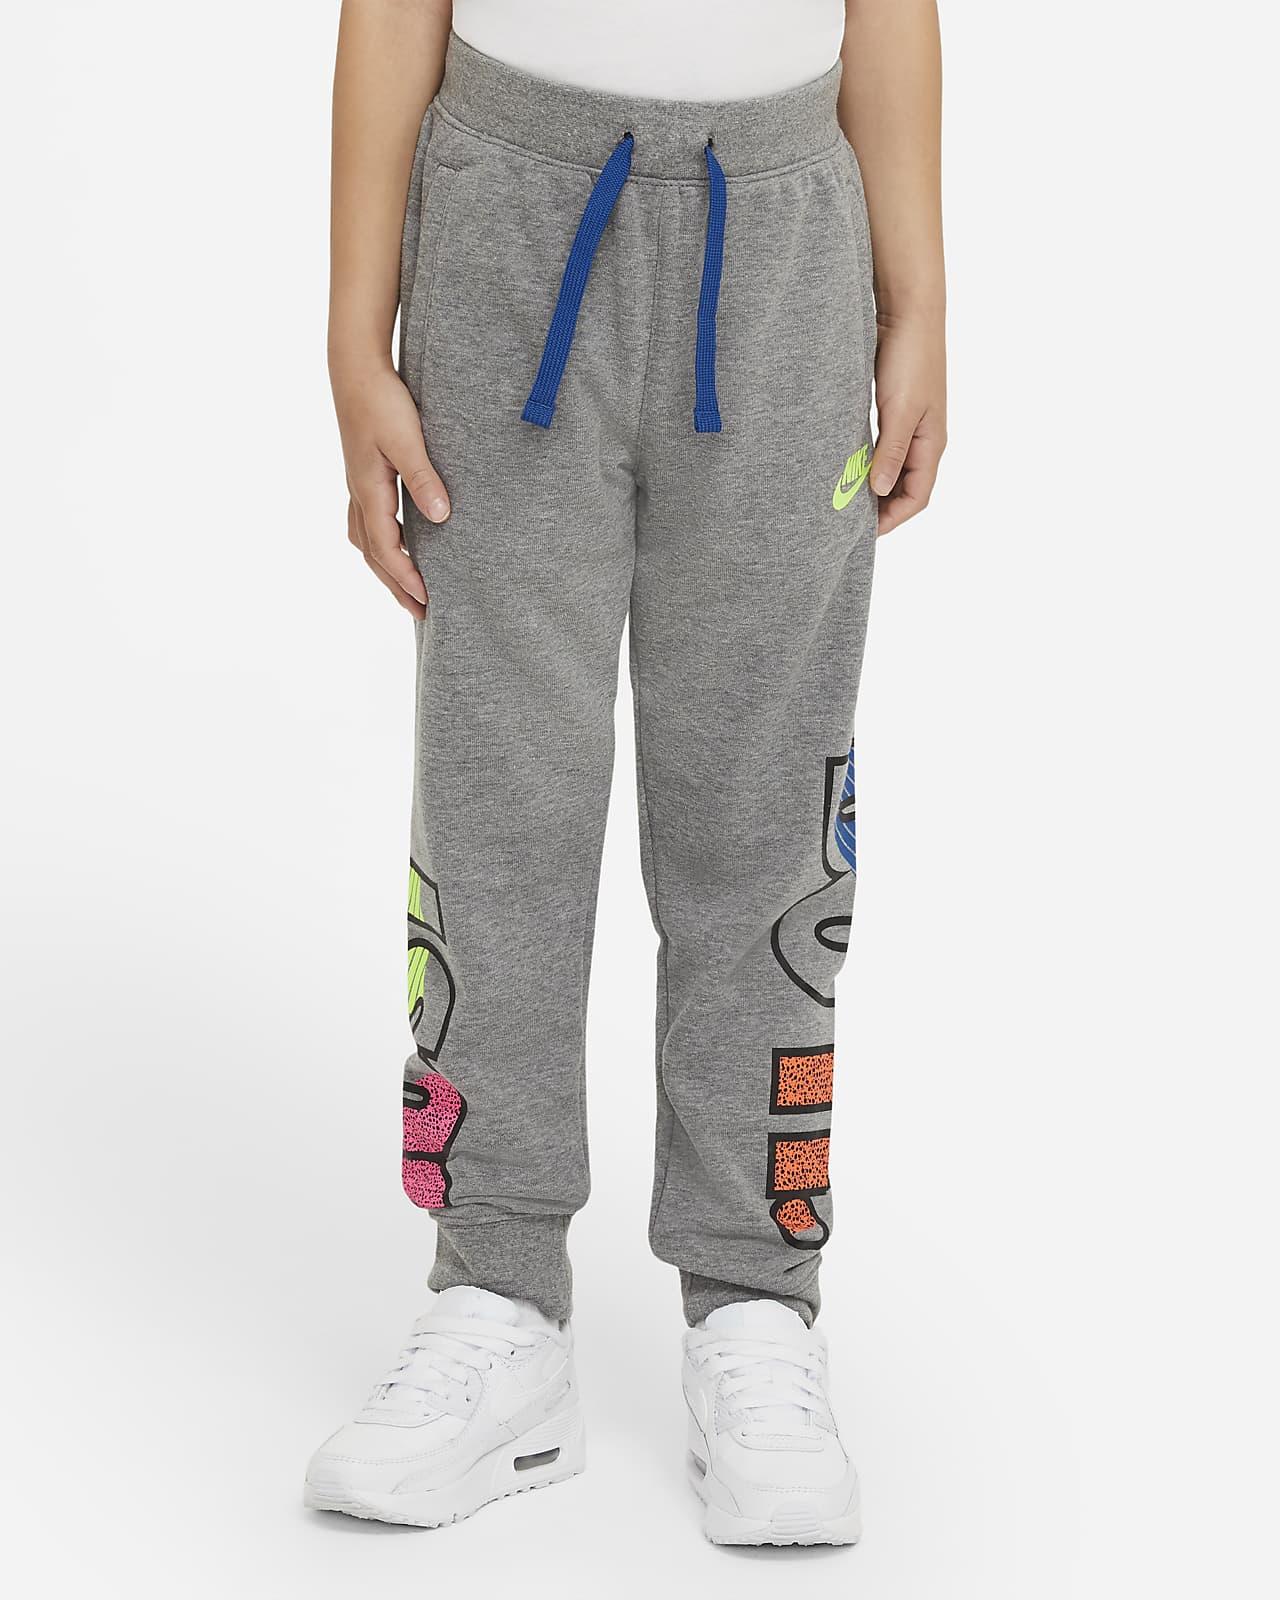 Pantalones Nike para niños talla pequeña